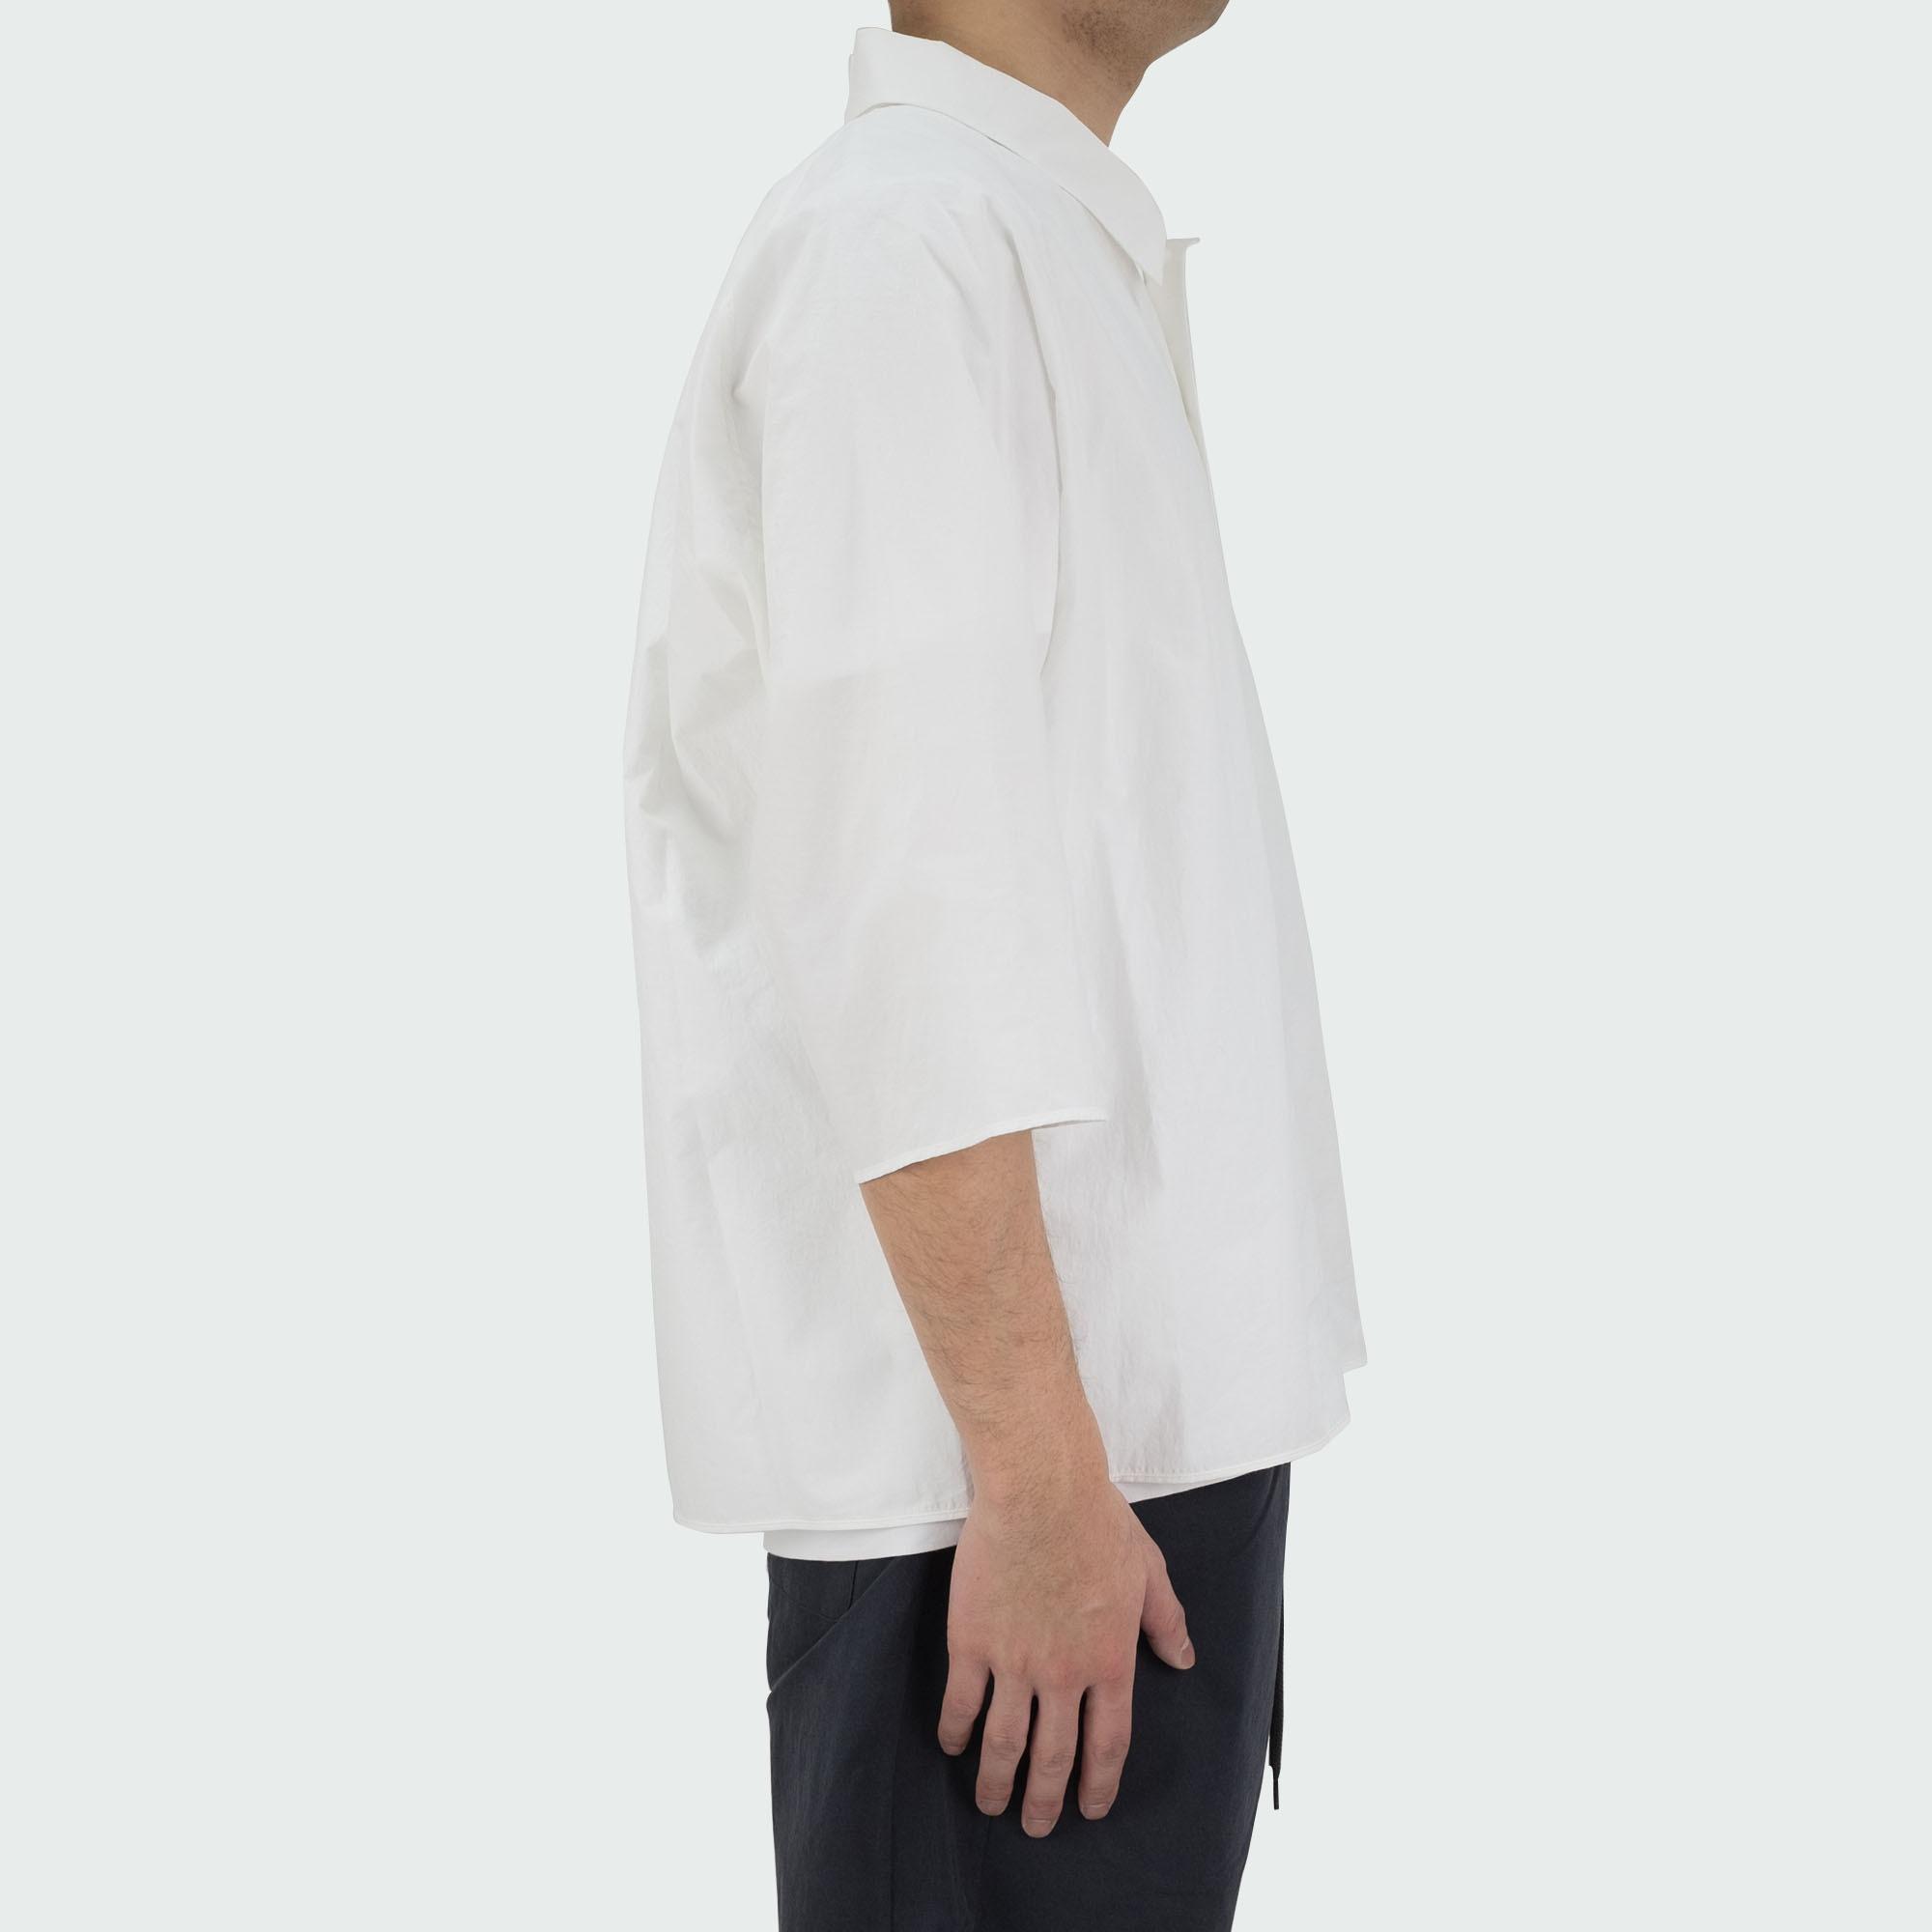 Dolman Sleeve S-S Shirt Off White 3